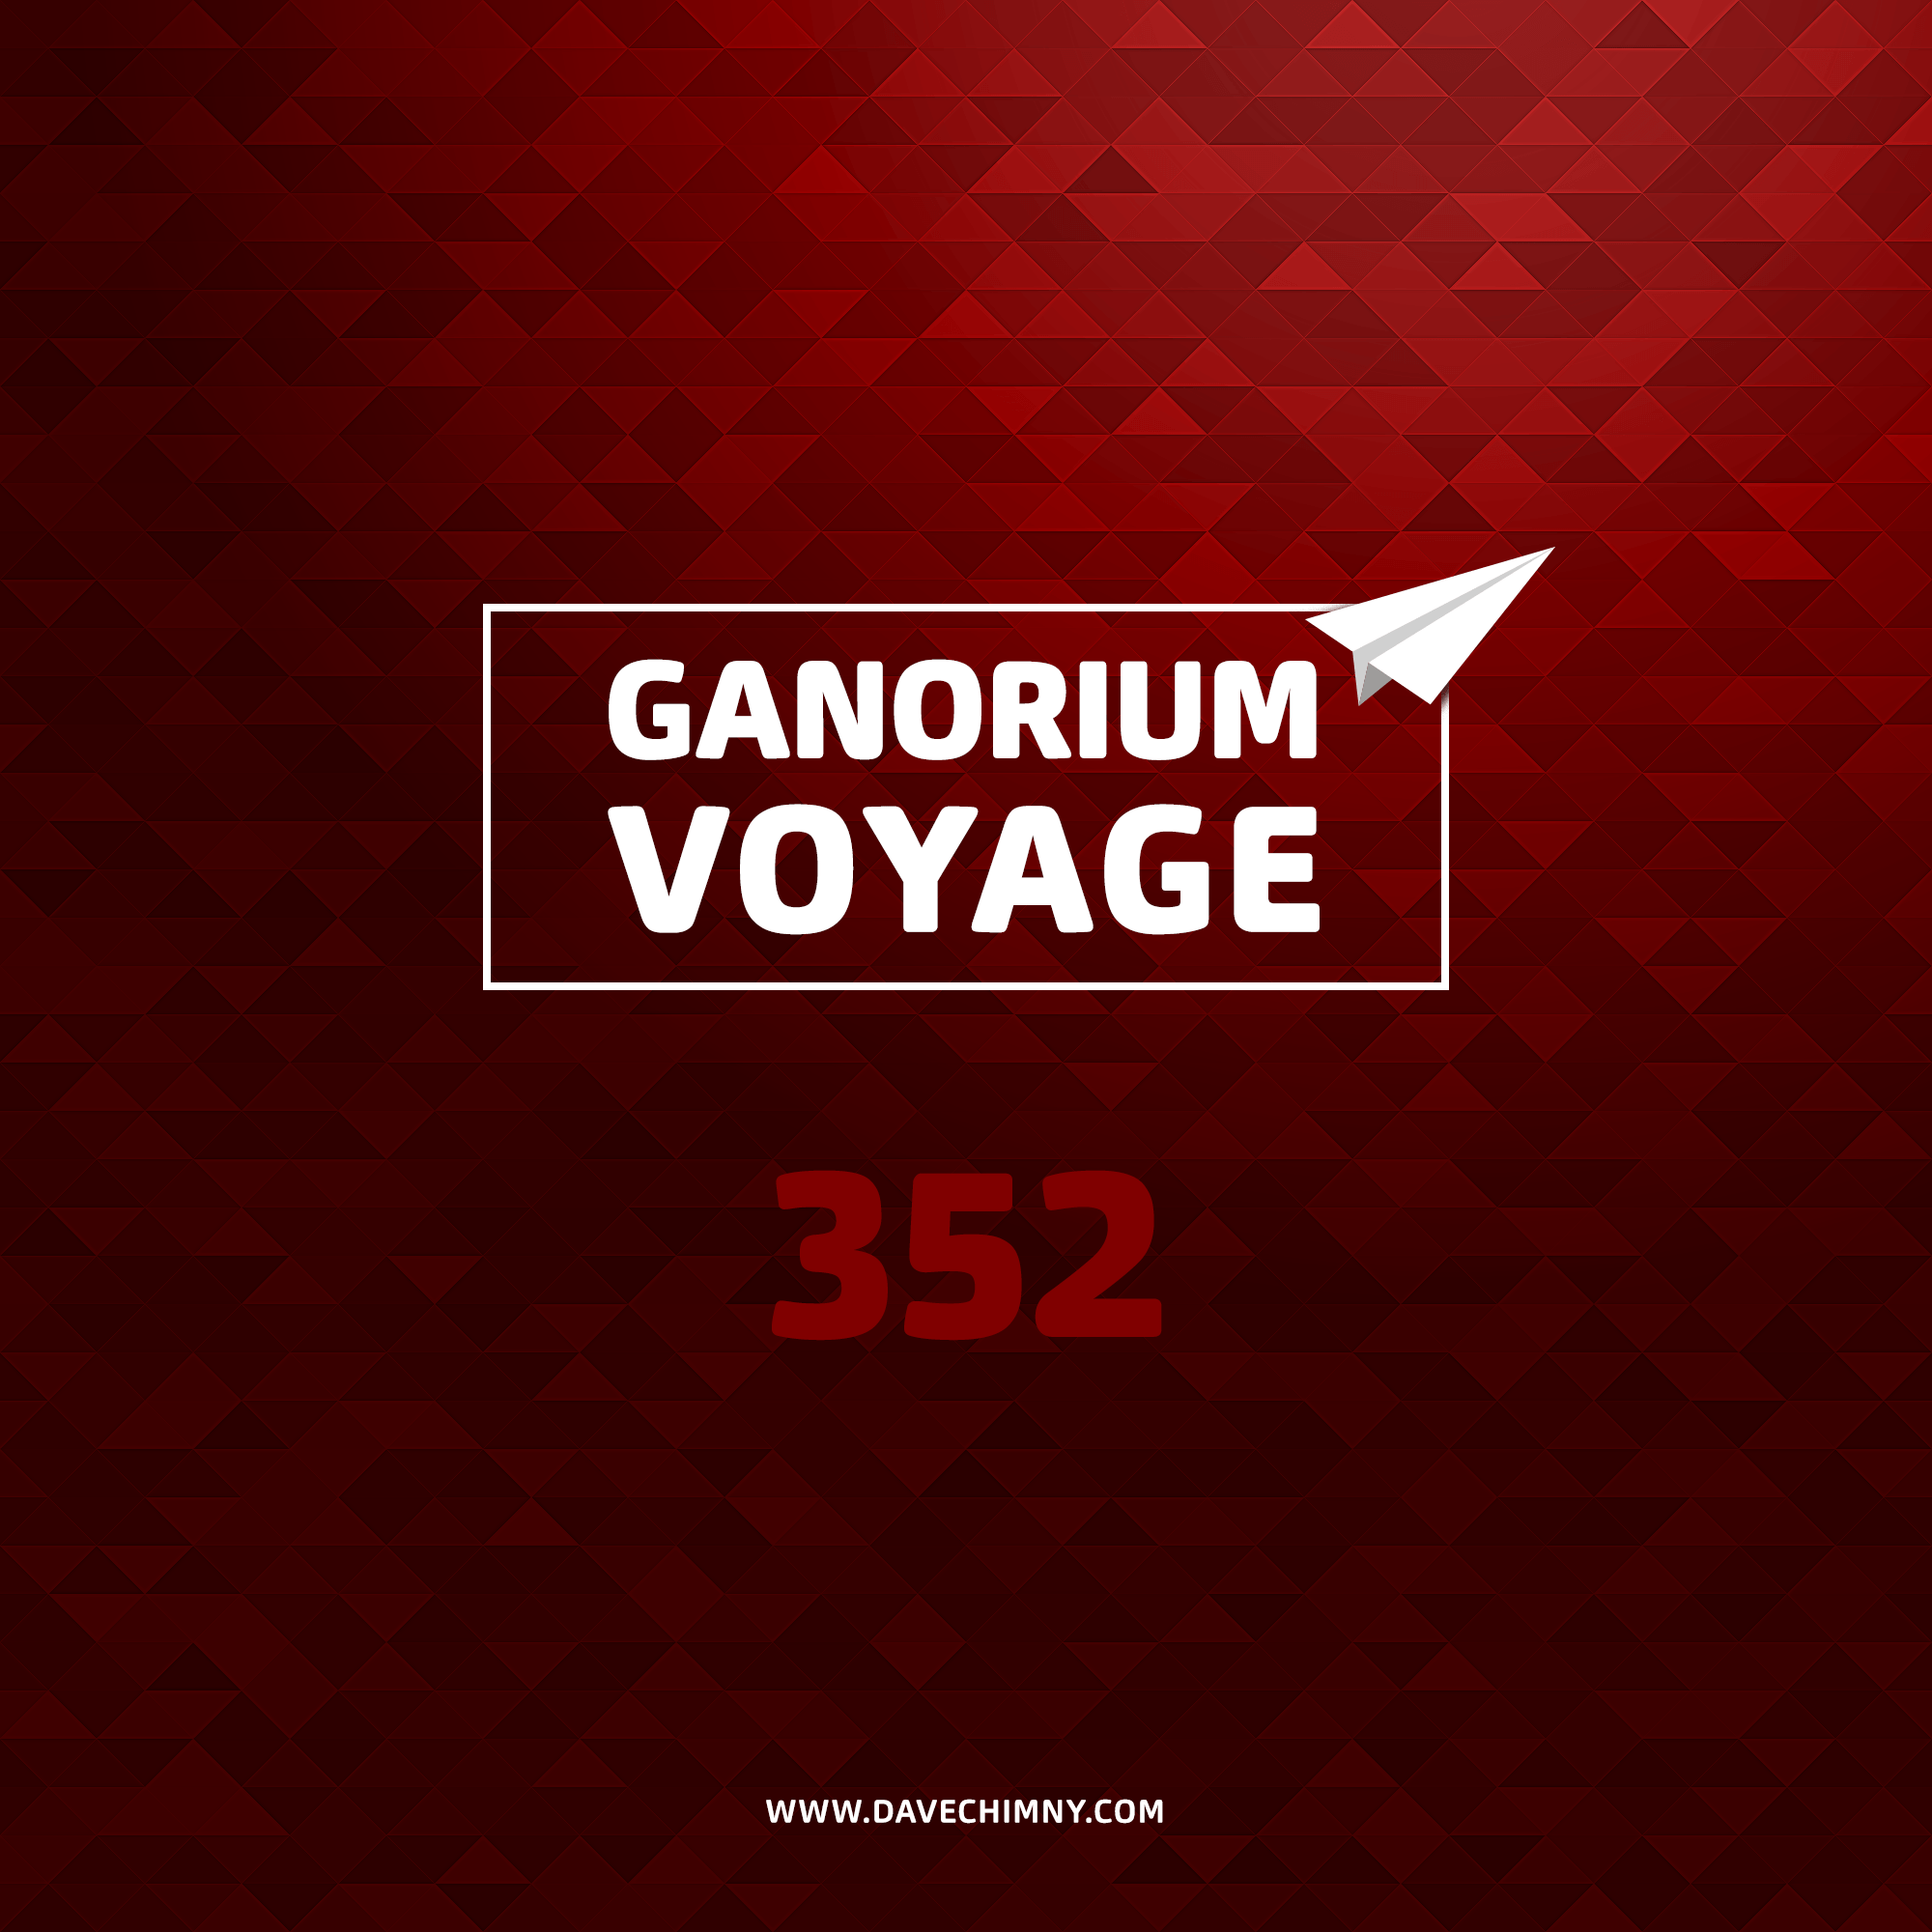 Dave Chimny – Ganorium Voyage 352